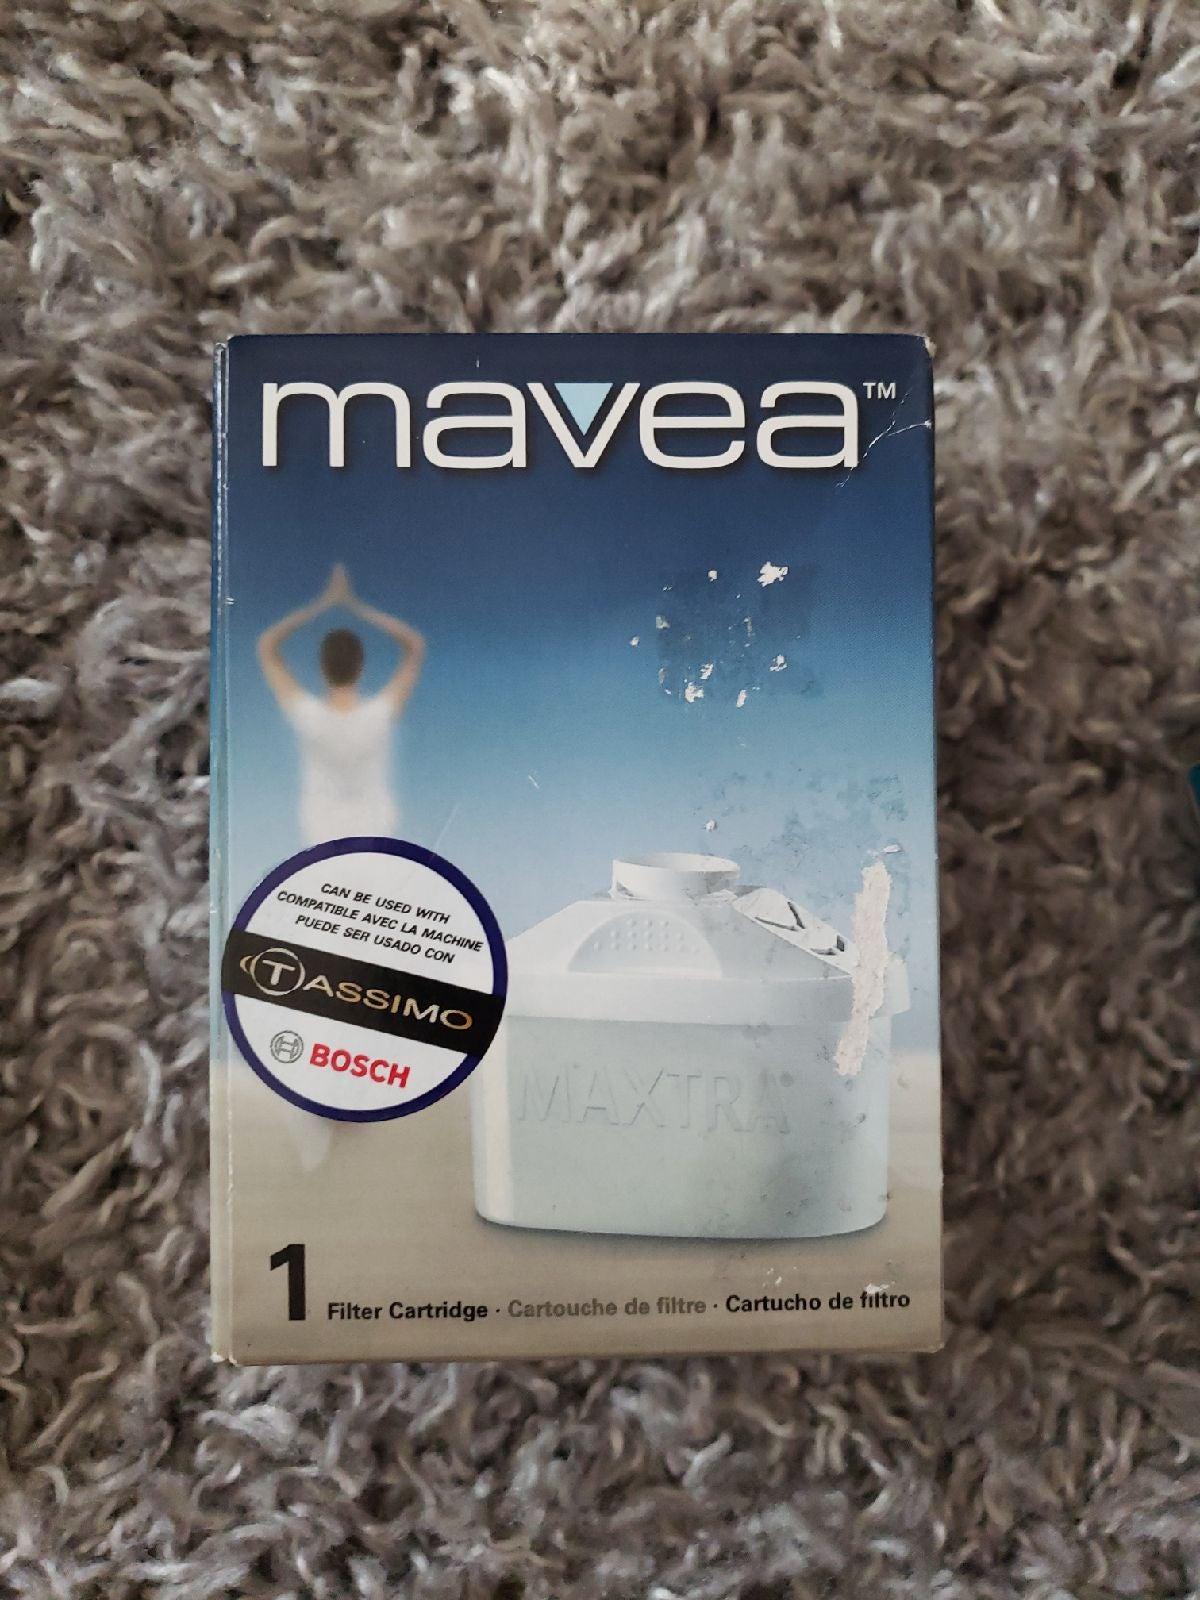 Mavea Tassimo Cartridge Filter